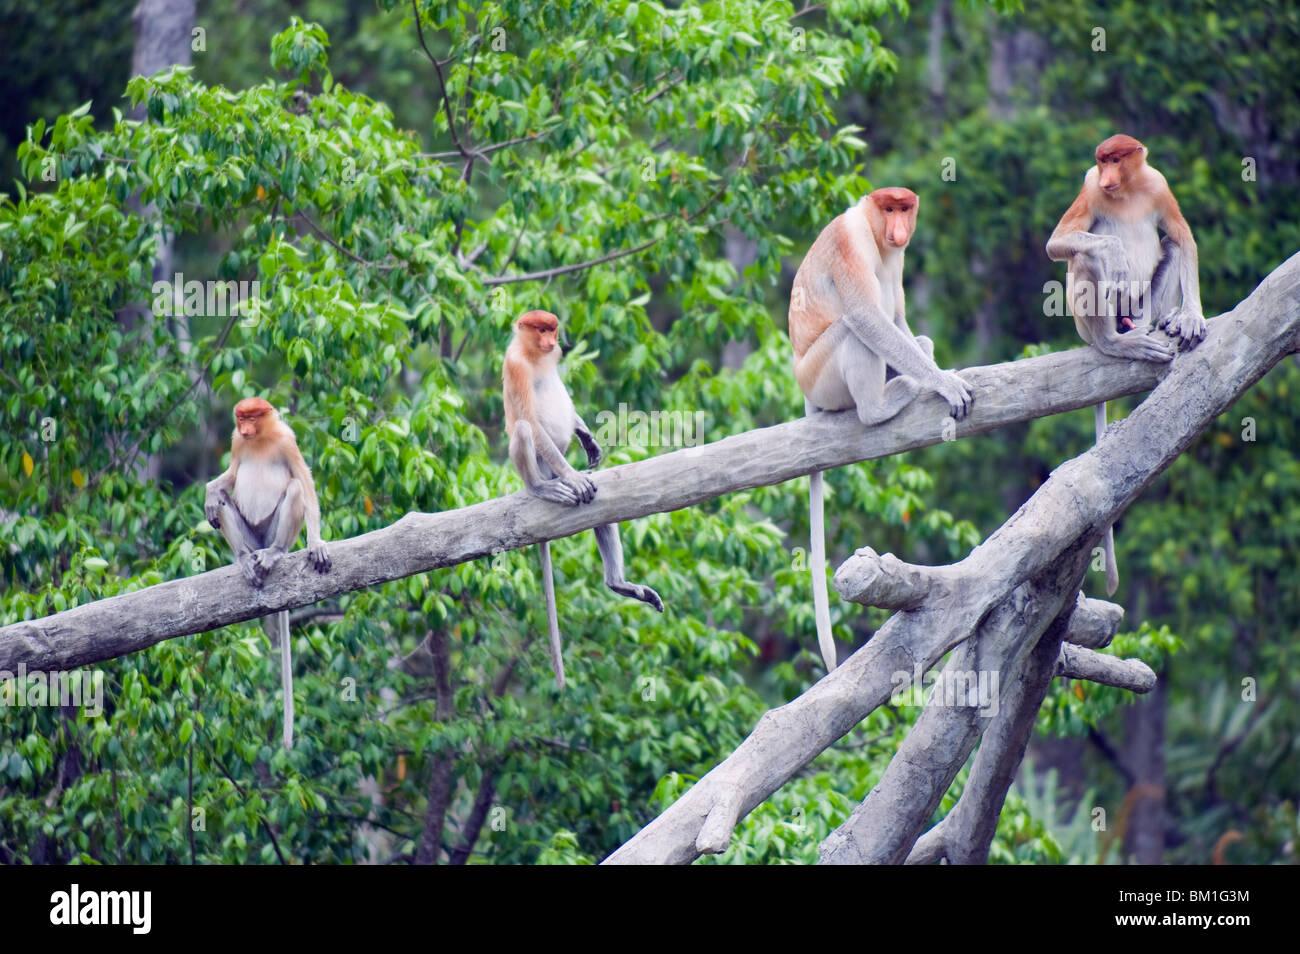 Nasenaffe, Labuk Bay Proboscis Monkey Sanctuary, Sabah, Borneo, Malaysia, Südostasien, Asien Stockbild